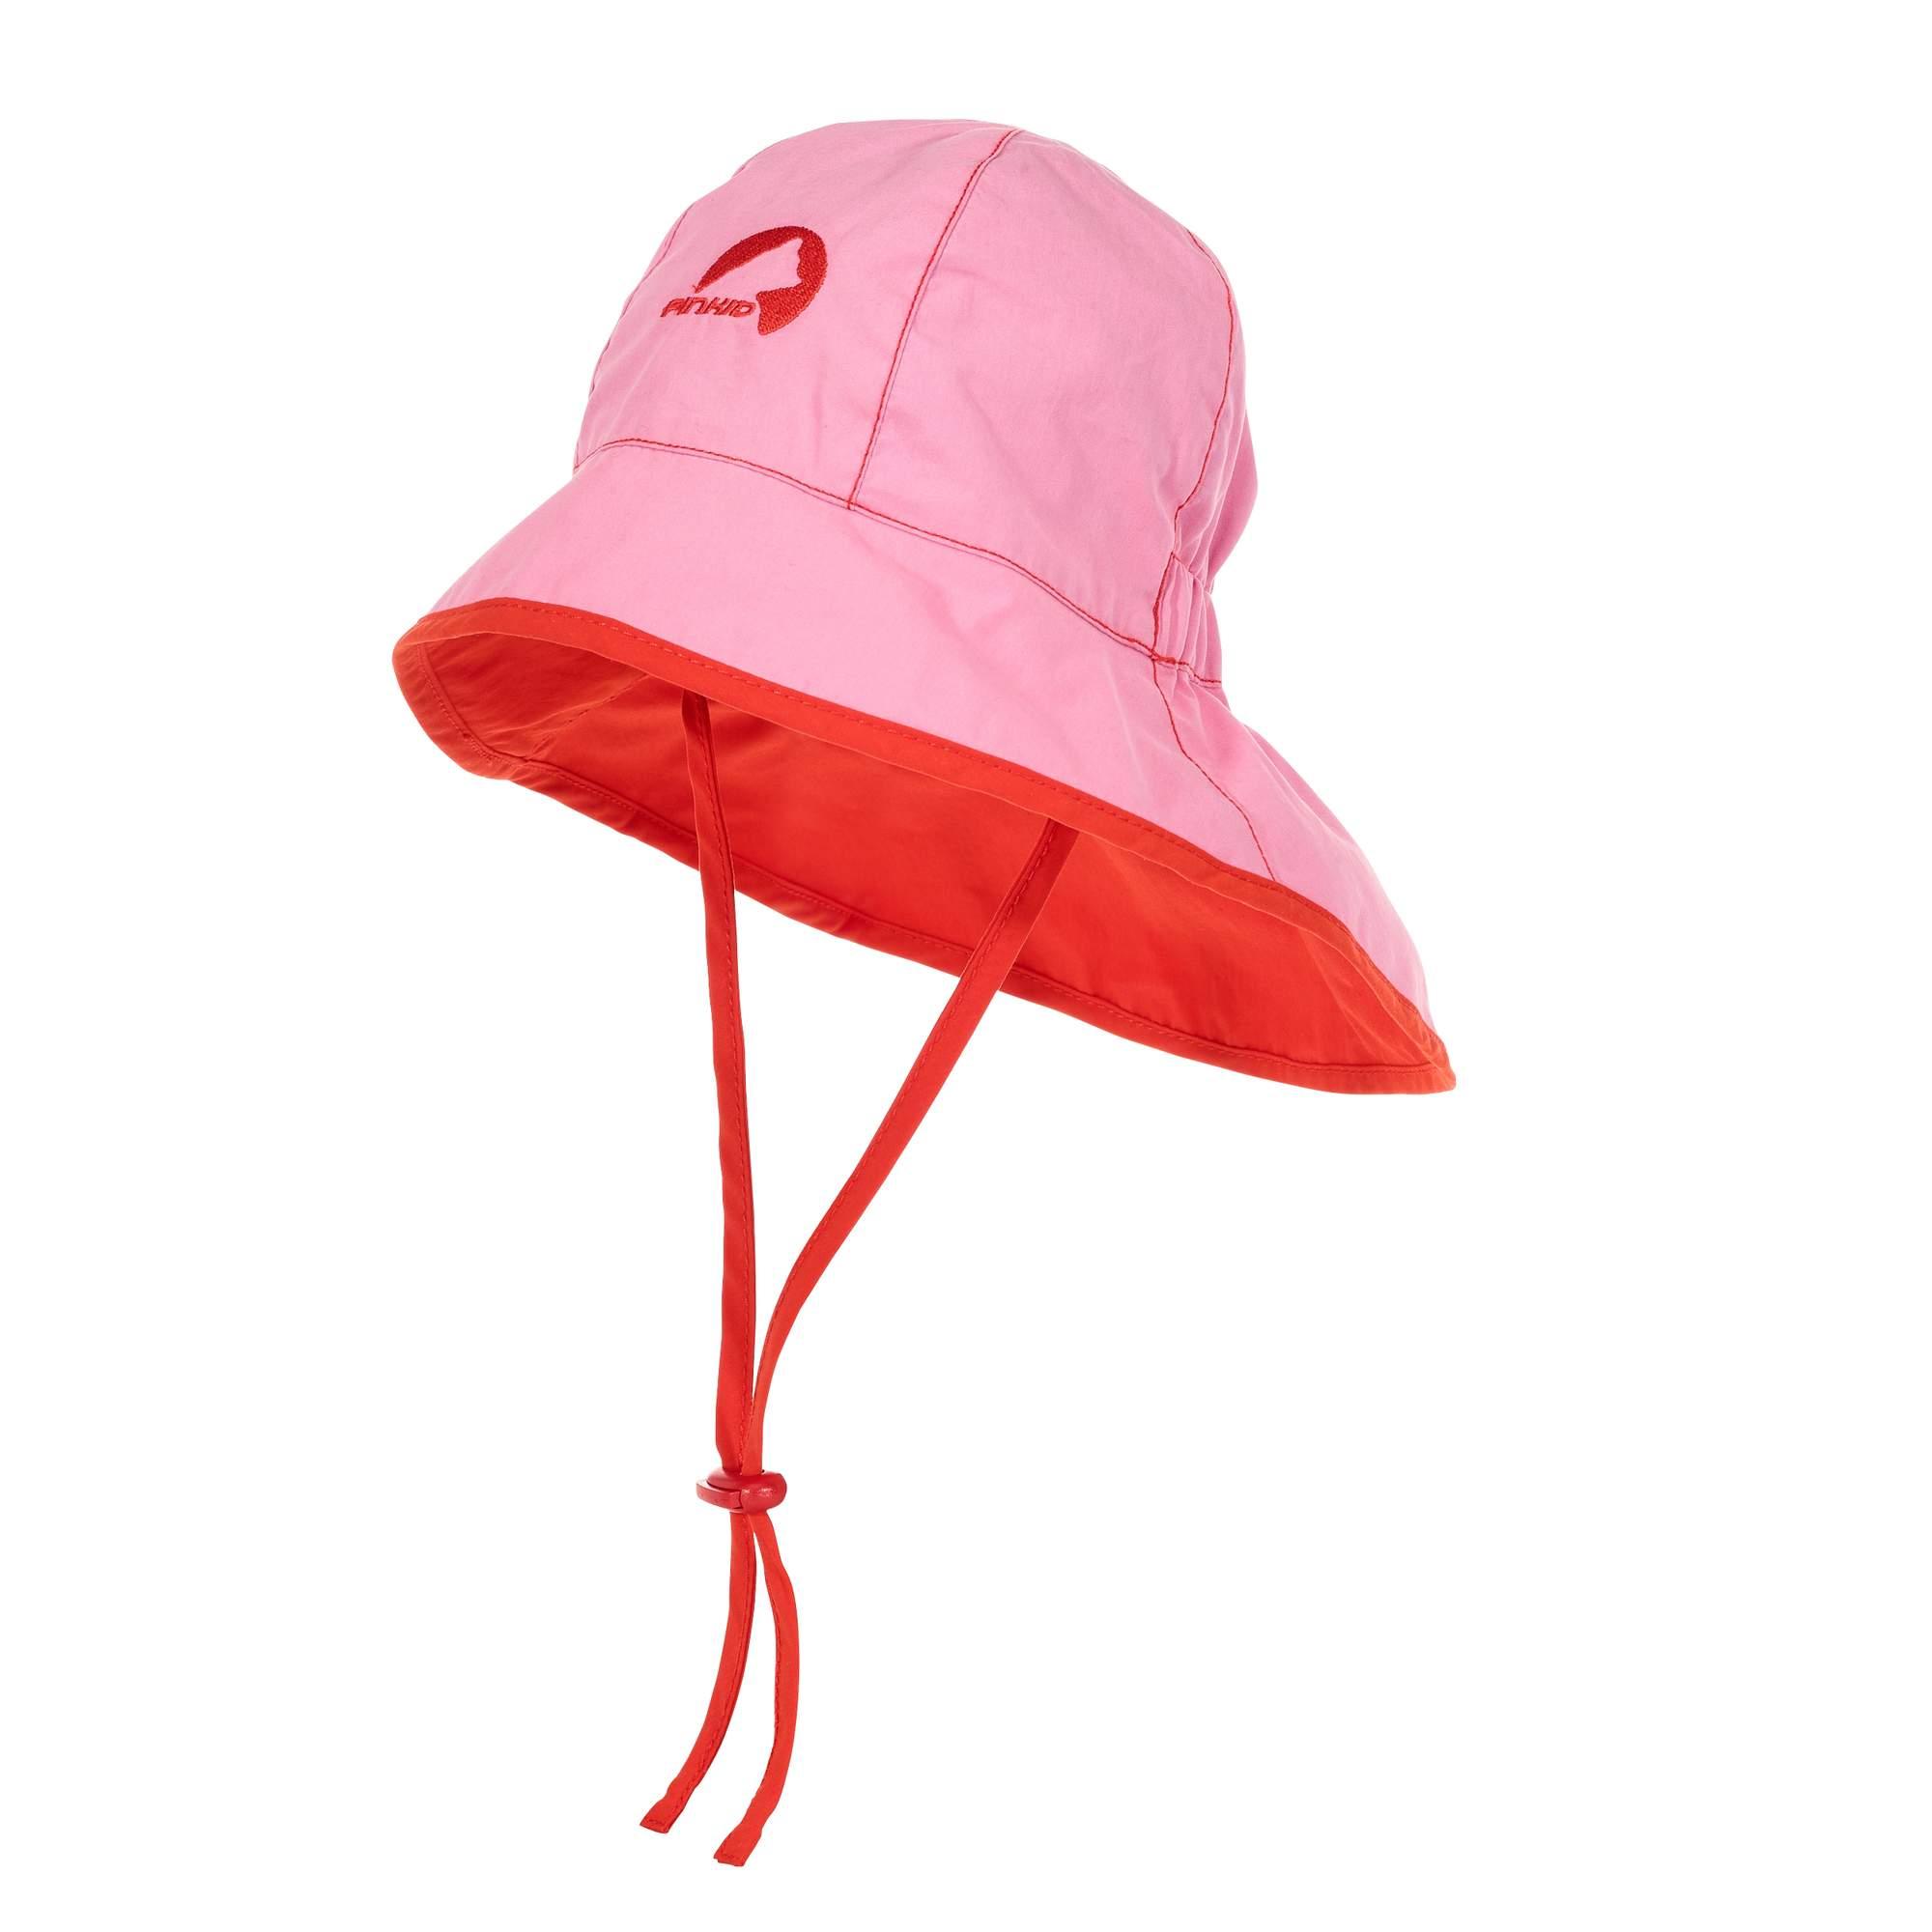 Finkid Ranta Sport Kinder Gr. 44 cm - pink-rosa / stardust/grenadine - Hüte 6031099